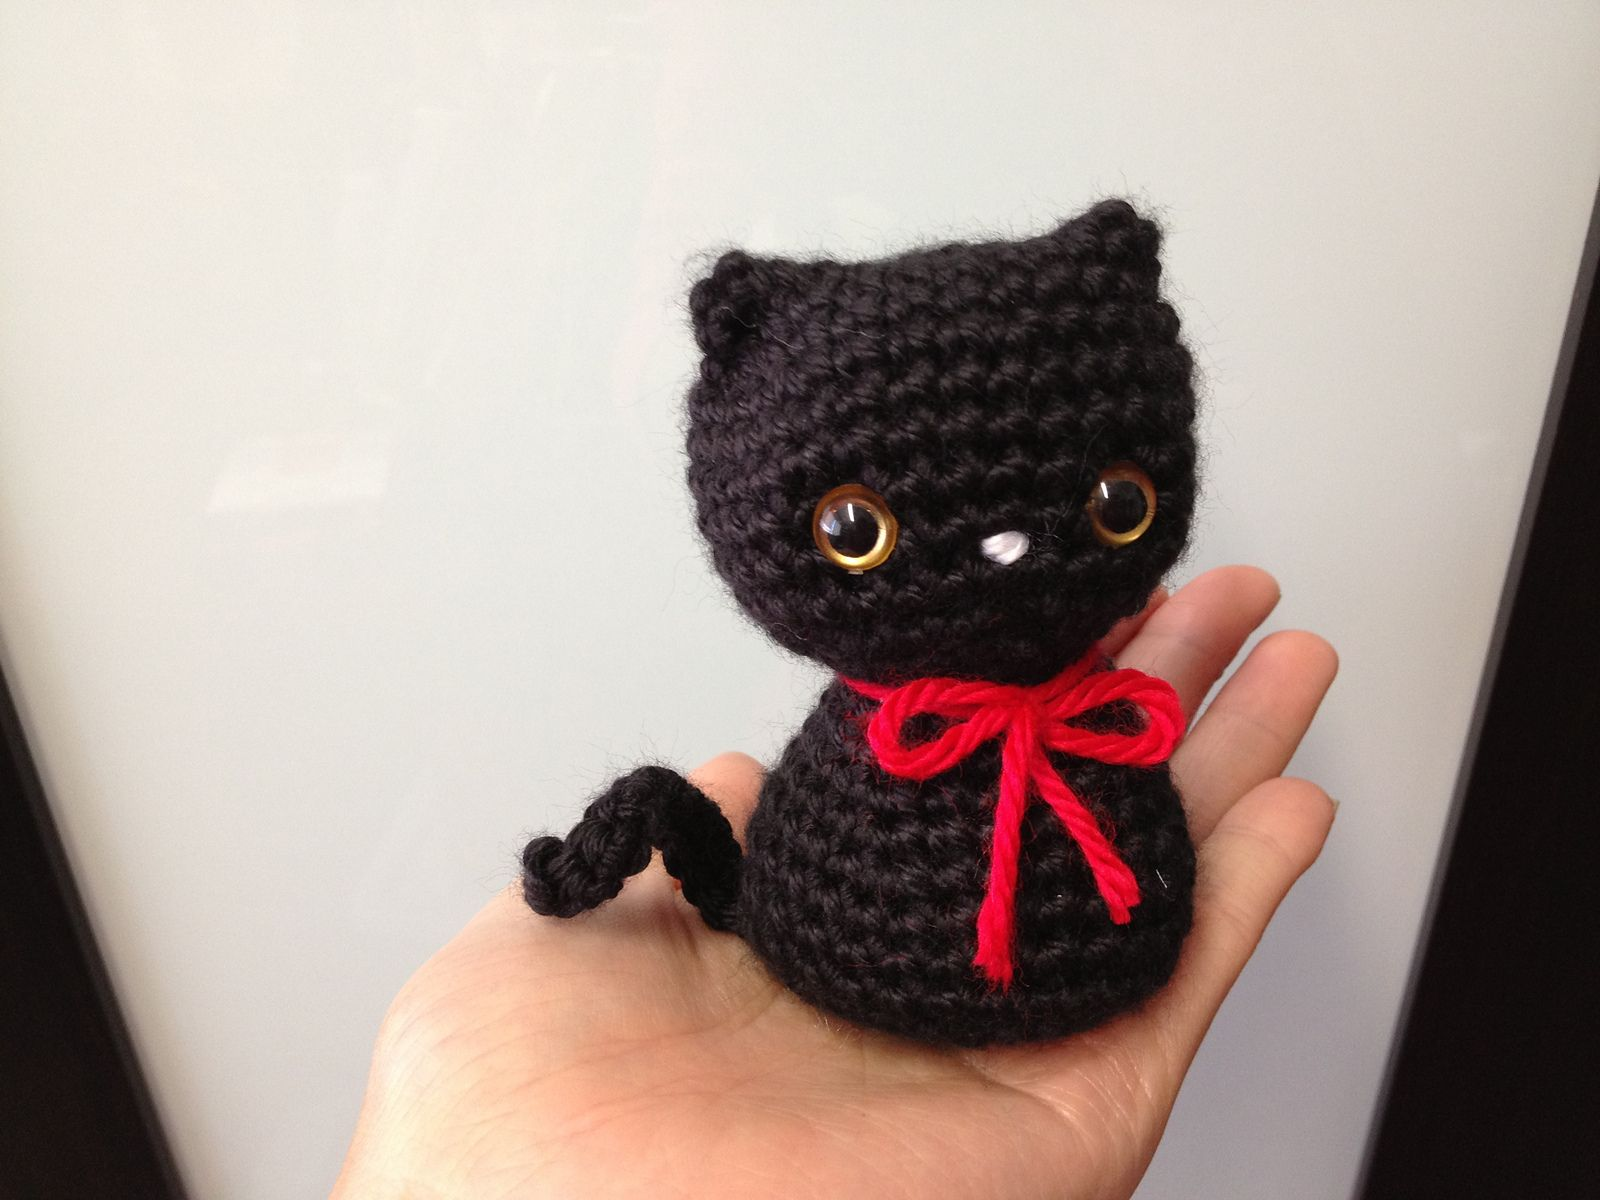 Crochet Colorful Kitty Cat Doll Toy By DDs Crochet - Free Crochet ...